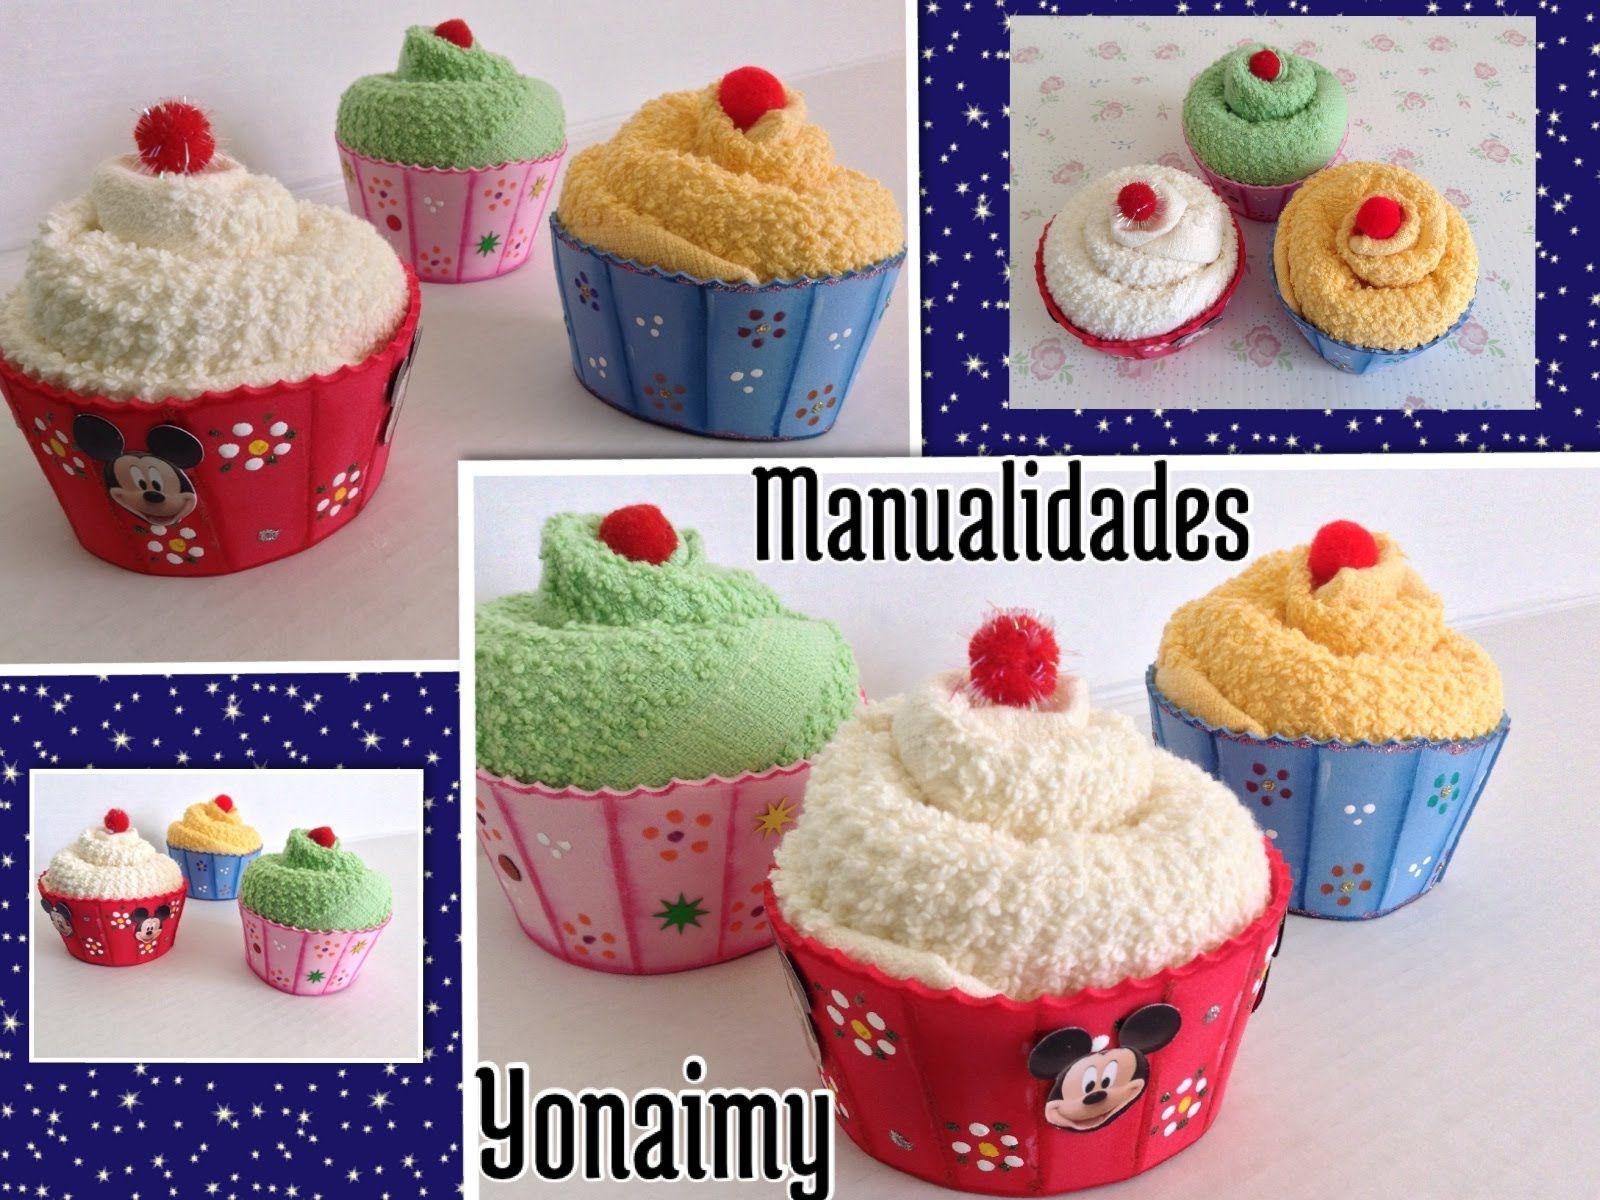 Cupcakes o panquecitos hechos con toallitas faciales y - Como se hace manualidades ...